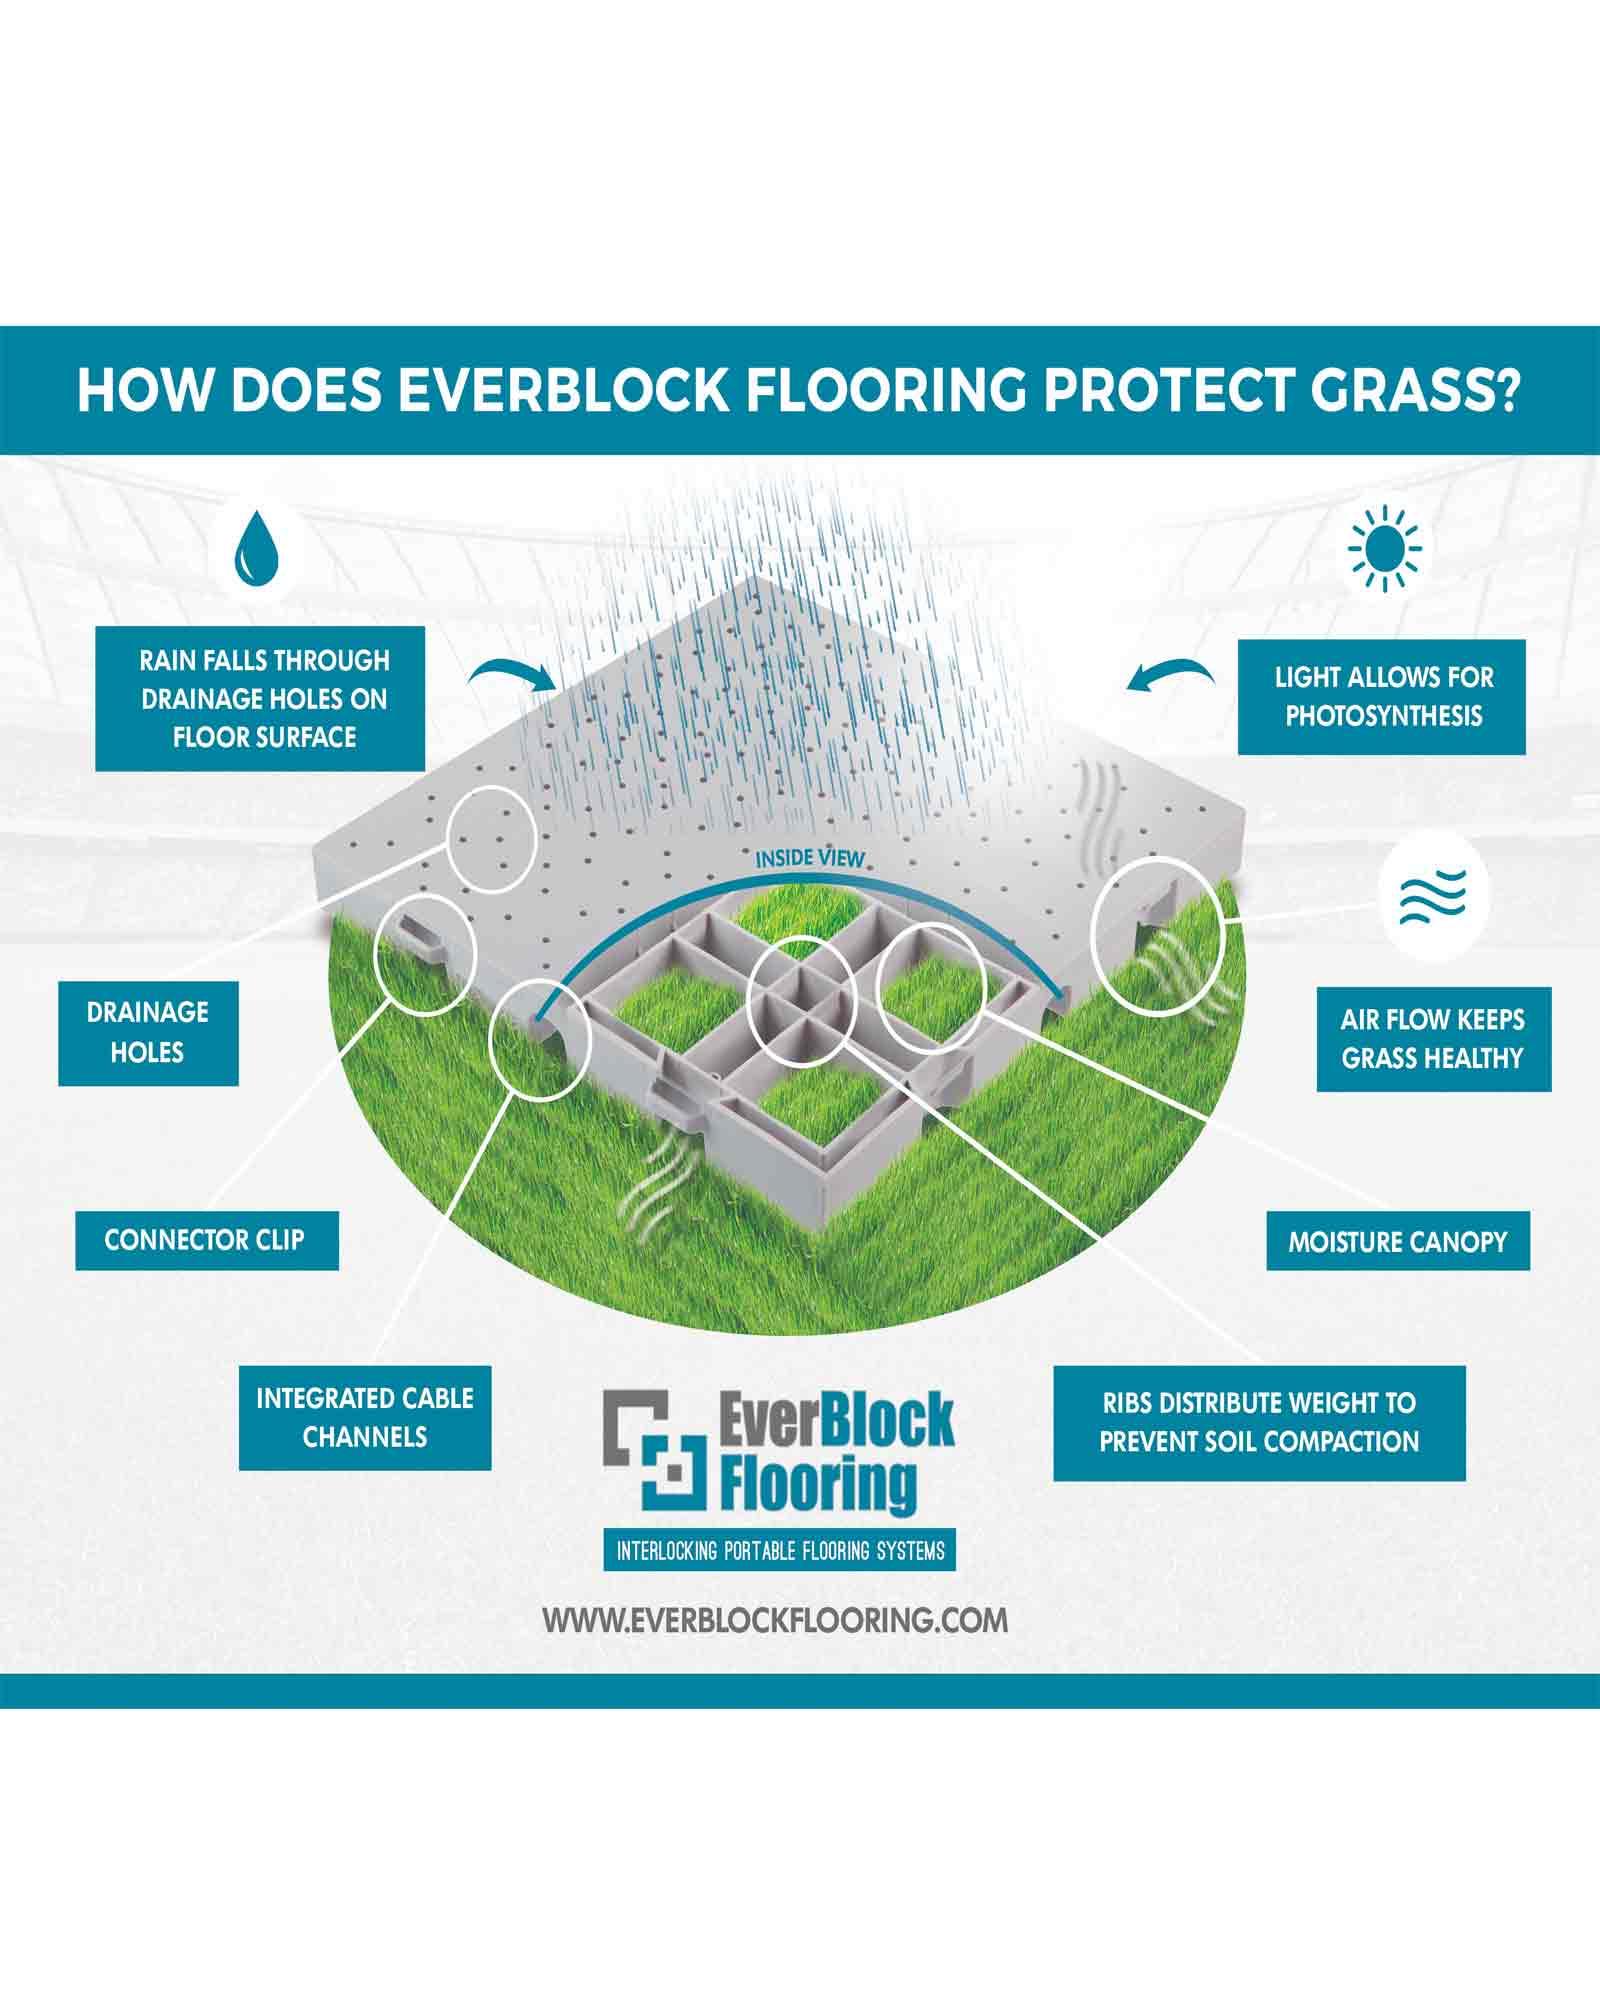 EverBlock Flooring protecting the grass below it